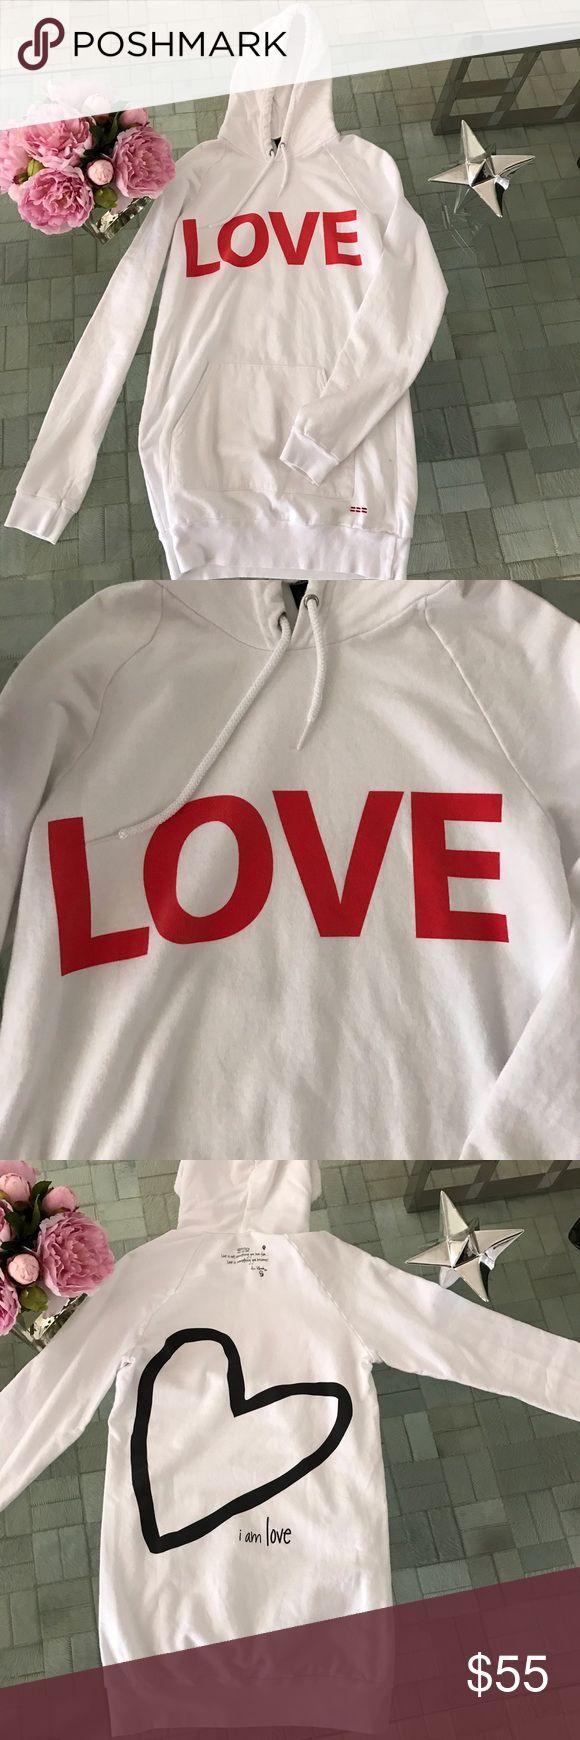 LAST PRICE DROP! Peace Love World shirt dress Peace Love World hooded shirt dress PEACE LOVE WORLD Dresses